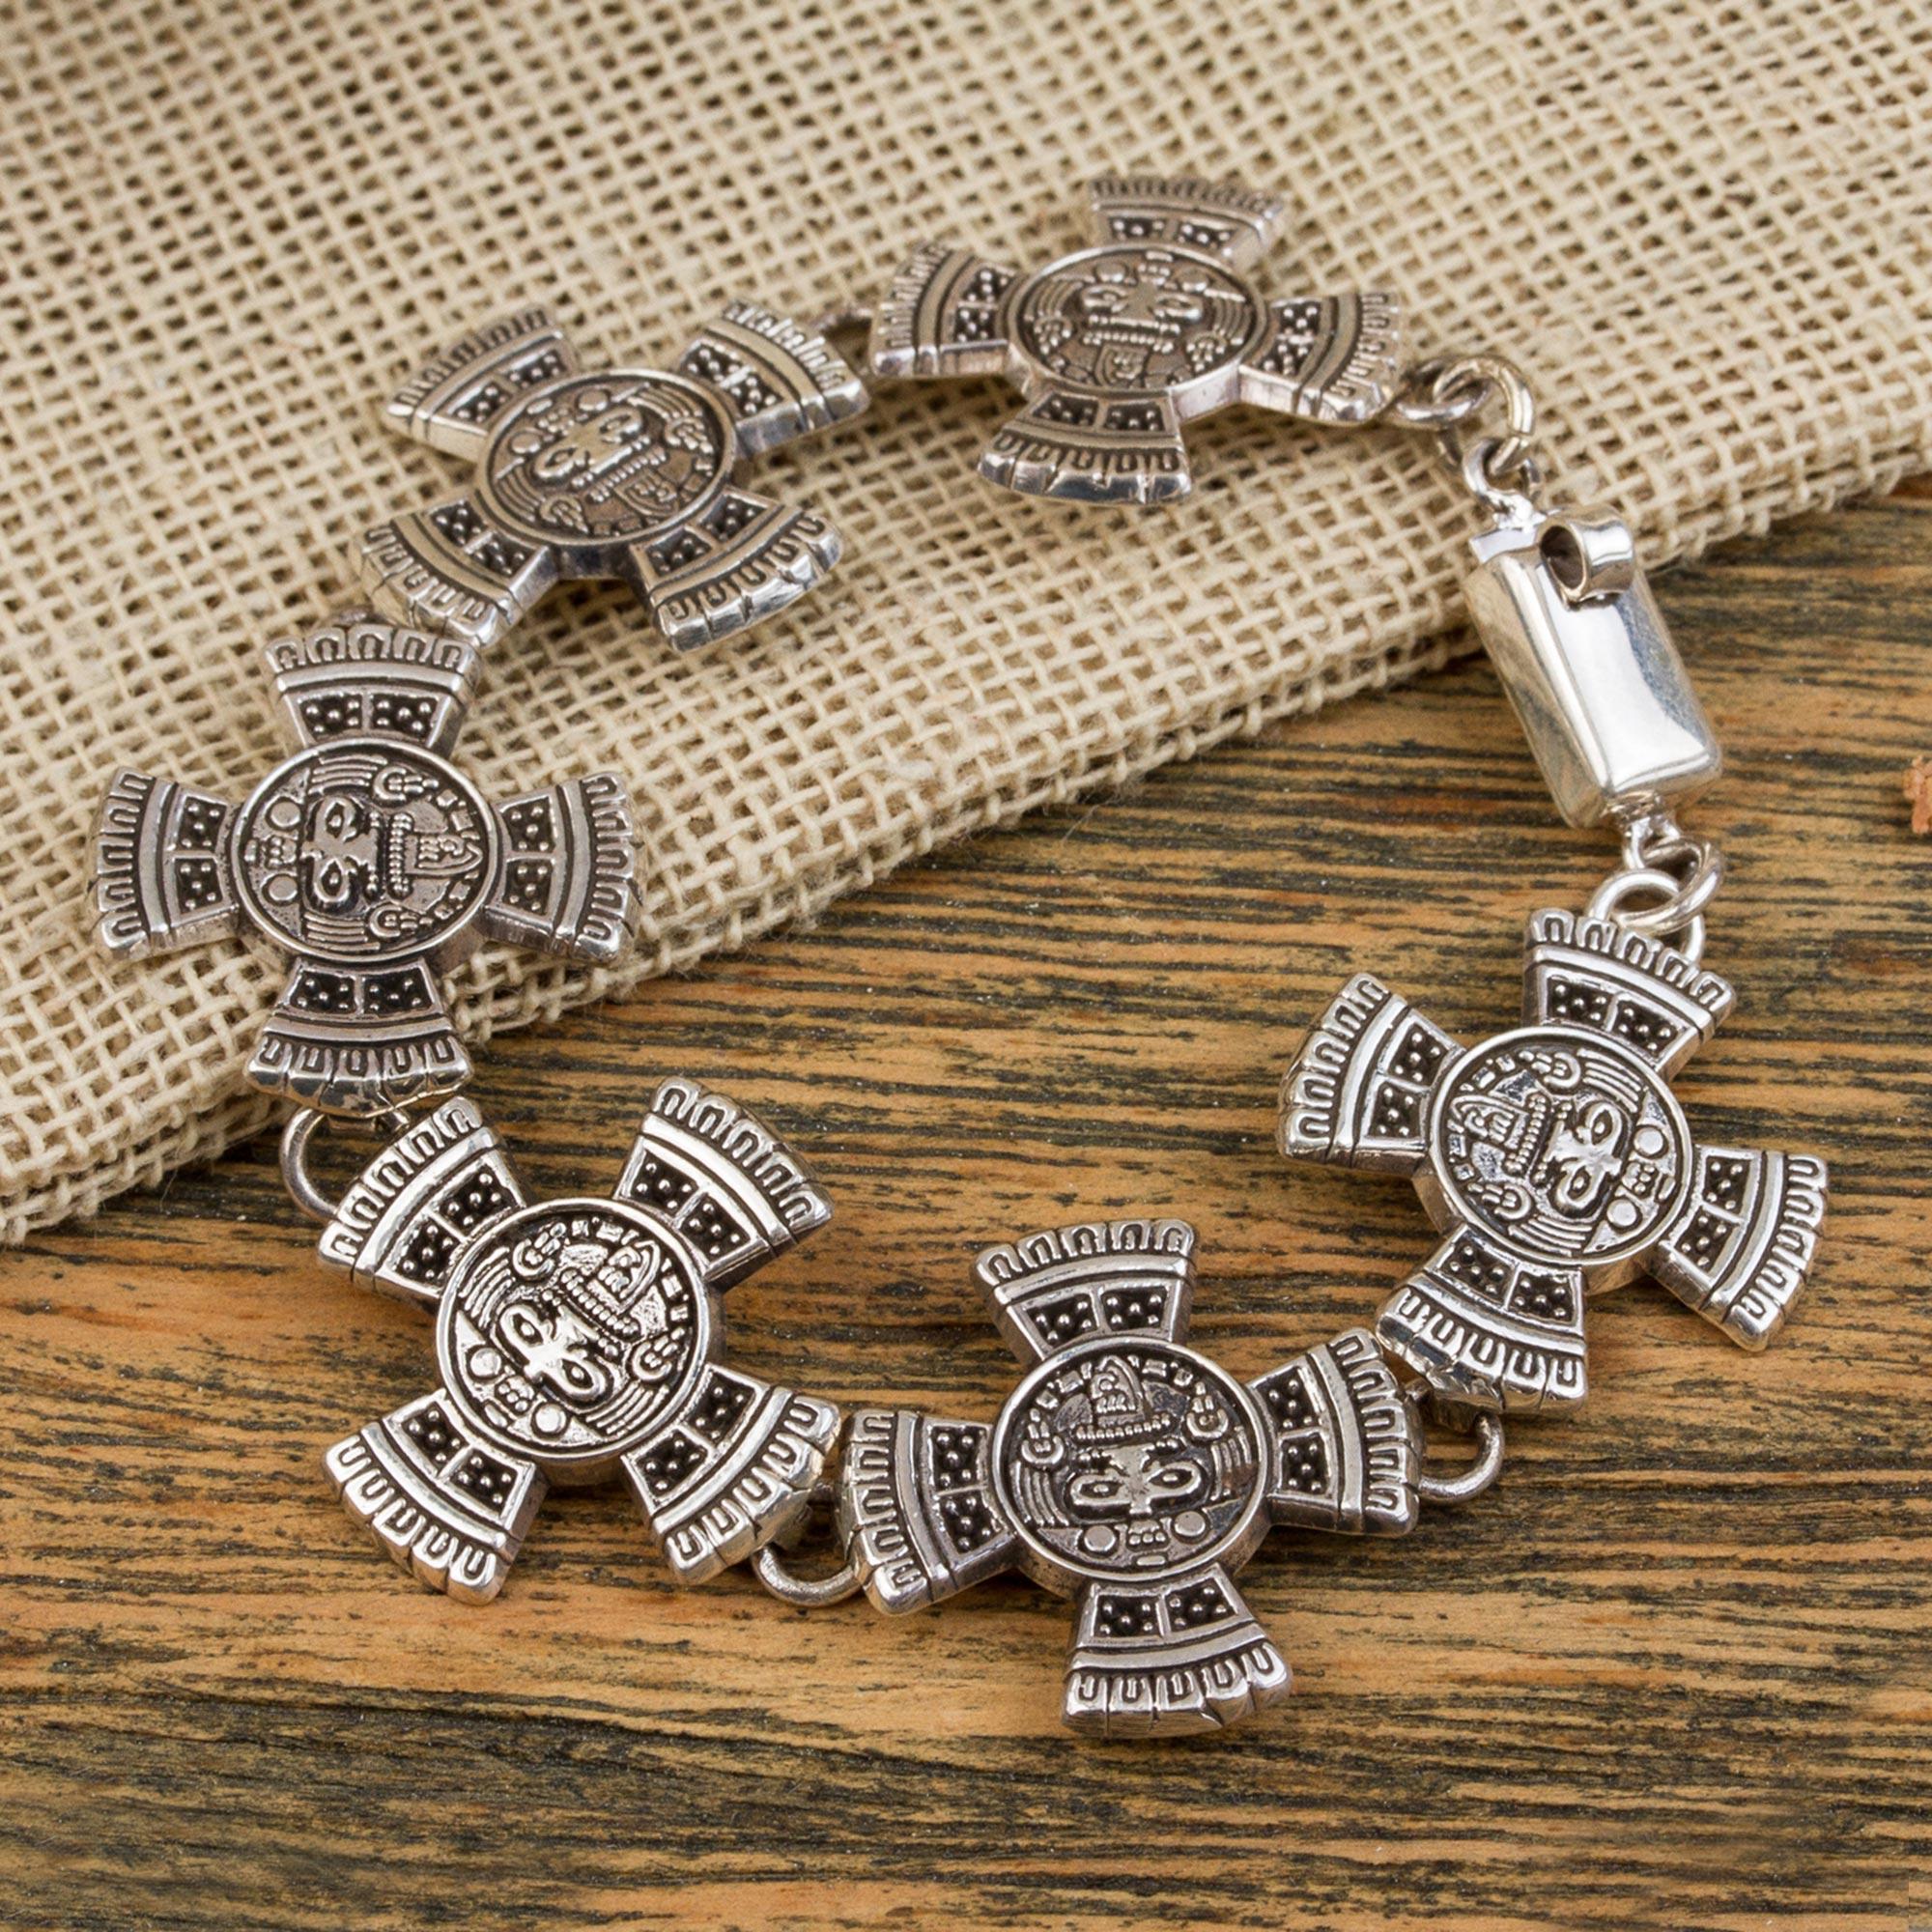 Aztec Calendar Stone.Sterling Silver Link Bracelet With Aztec Motifs Mexico Aztec Calendar Stone